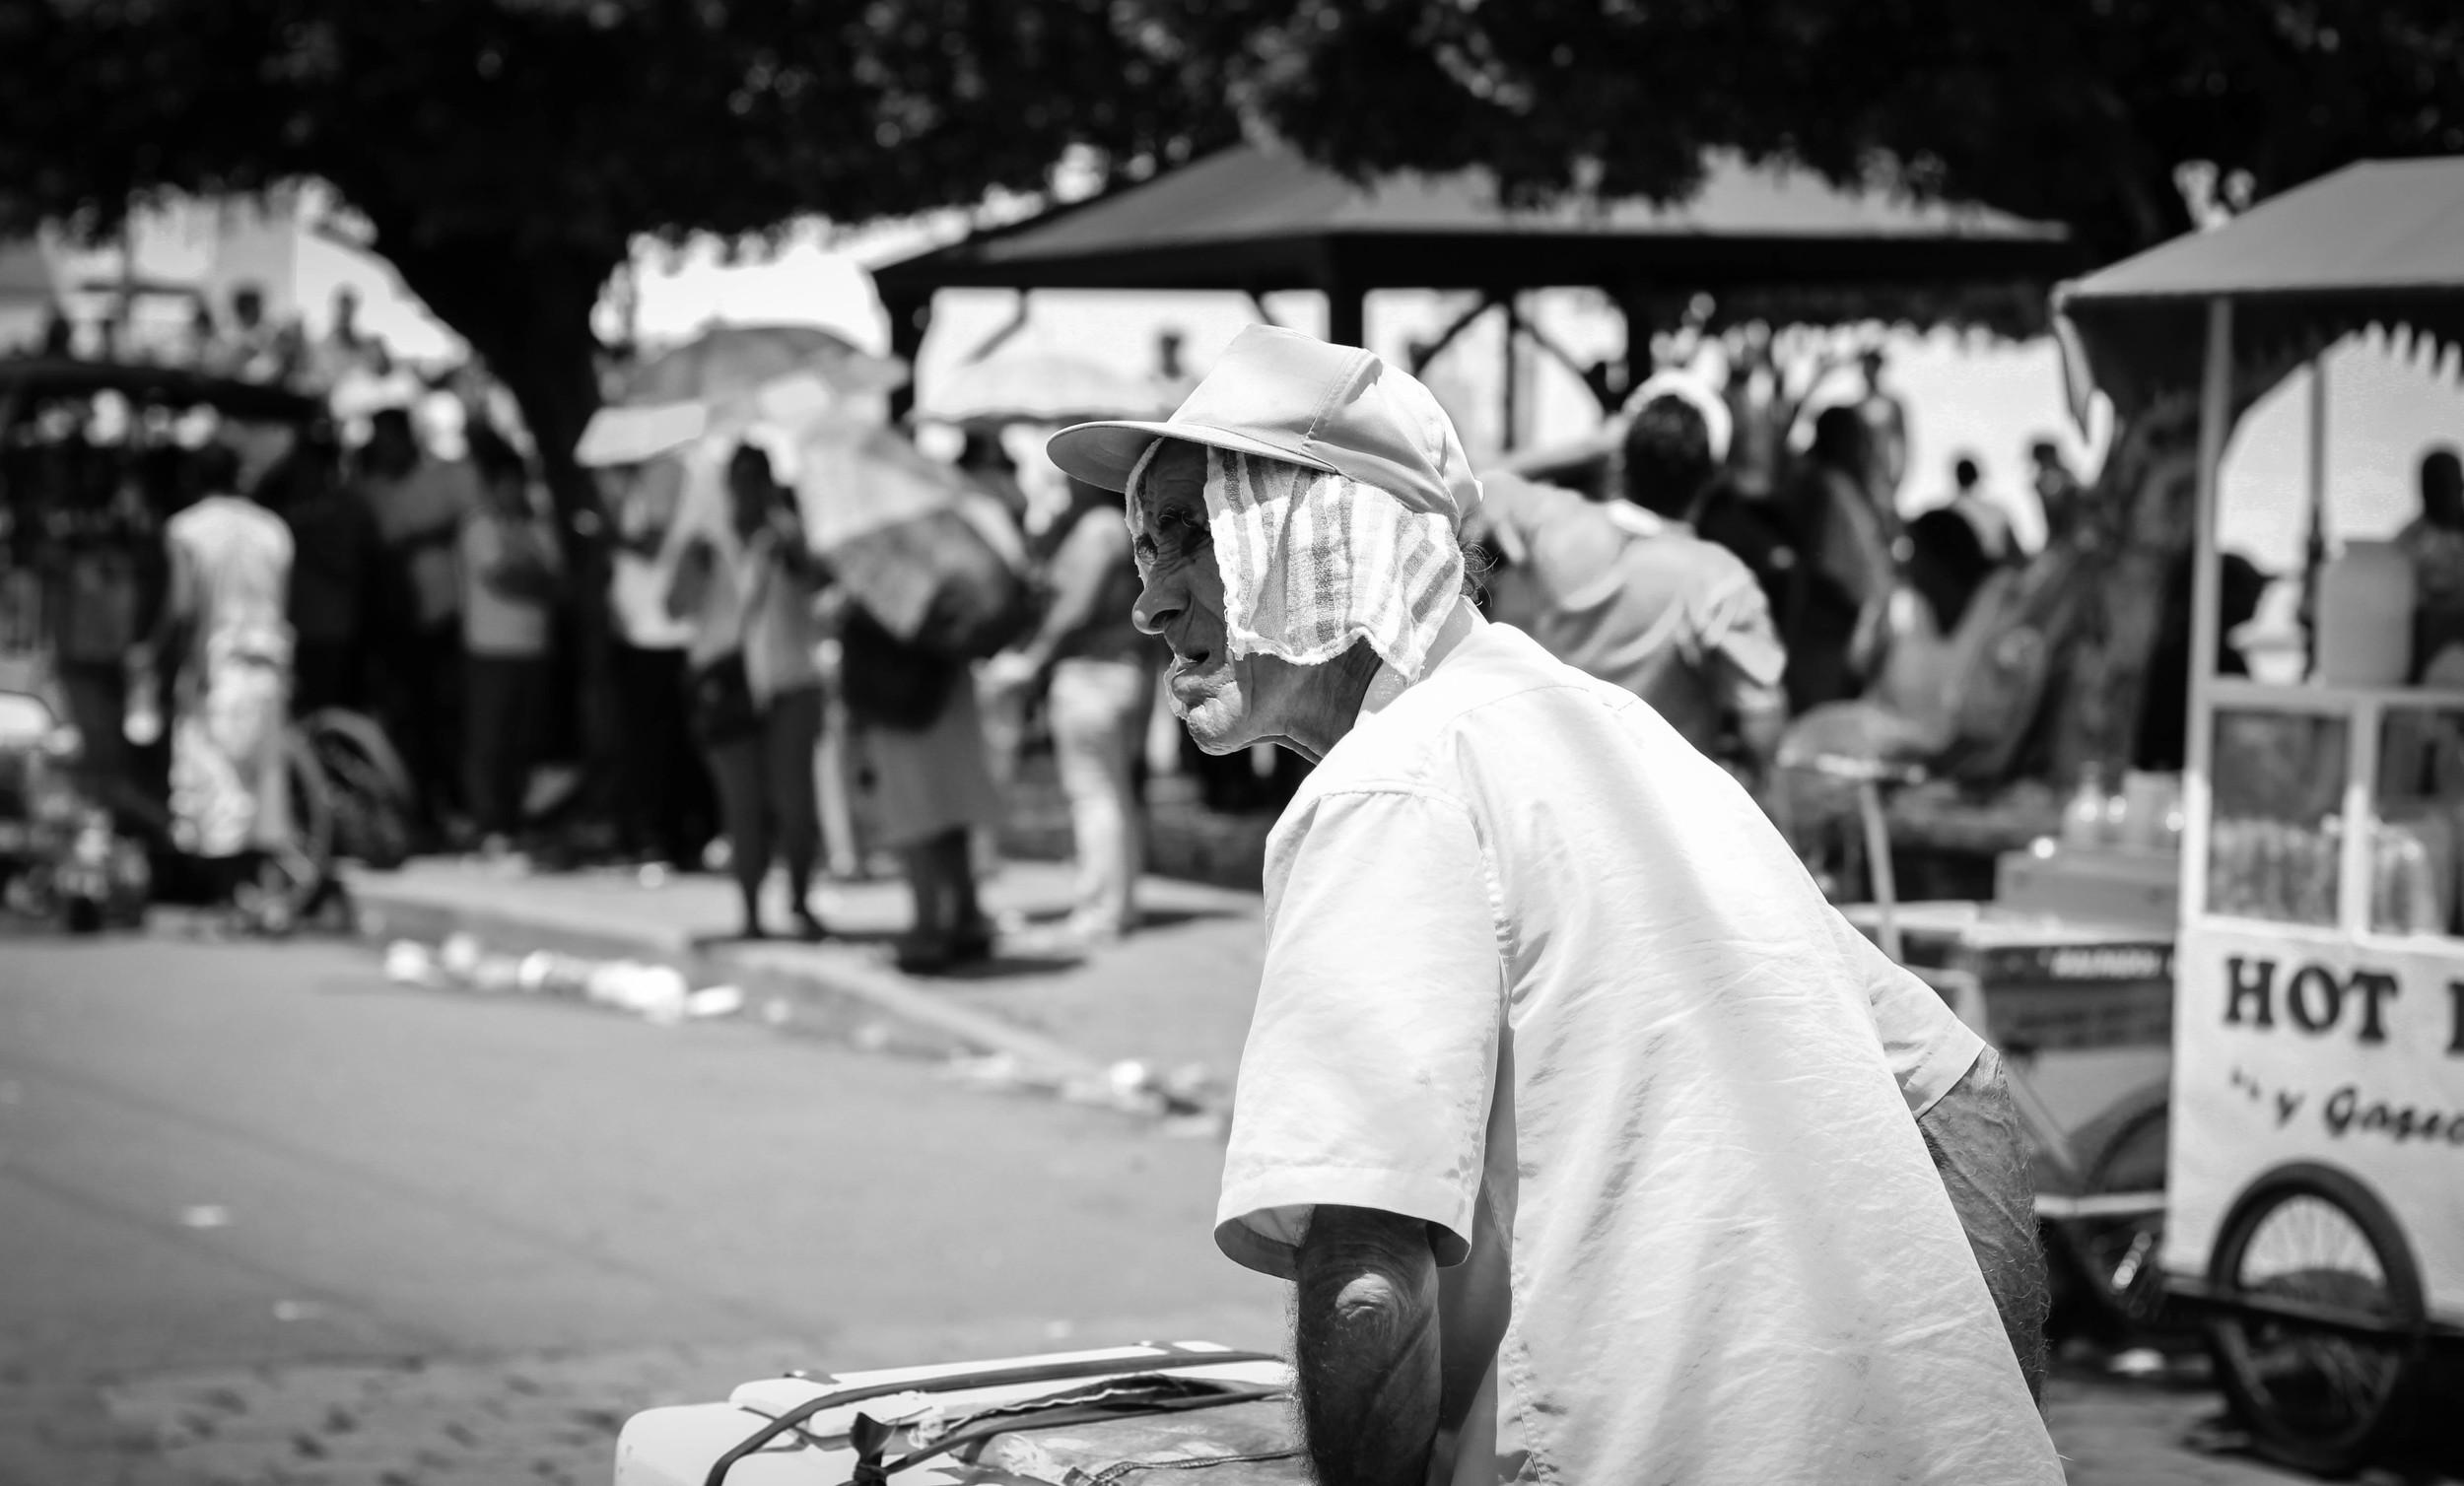 old-man-ice-cream-cart